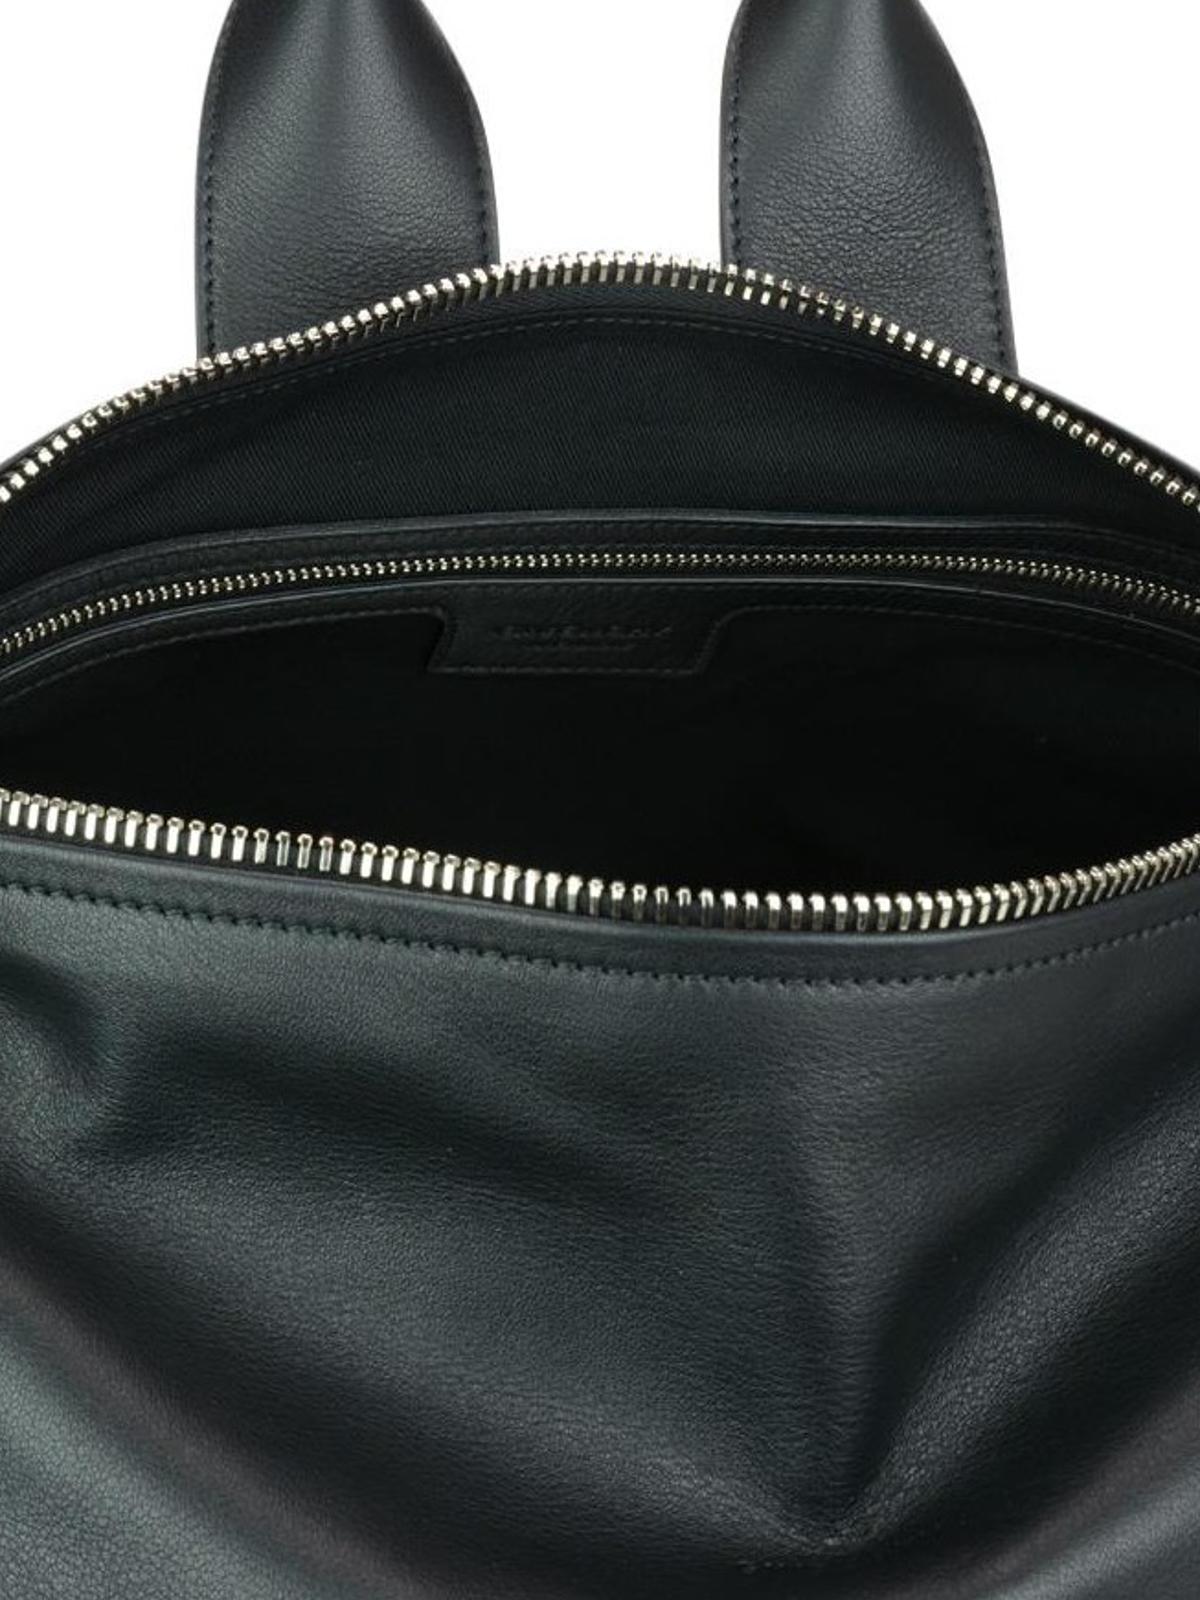 6ce1b781bc Givenchy - Pandora calf leather messenger bag - Luggage   Travel ...